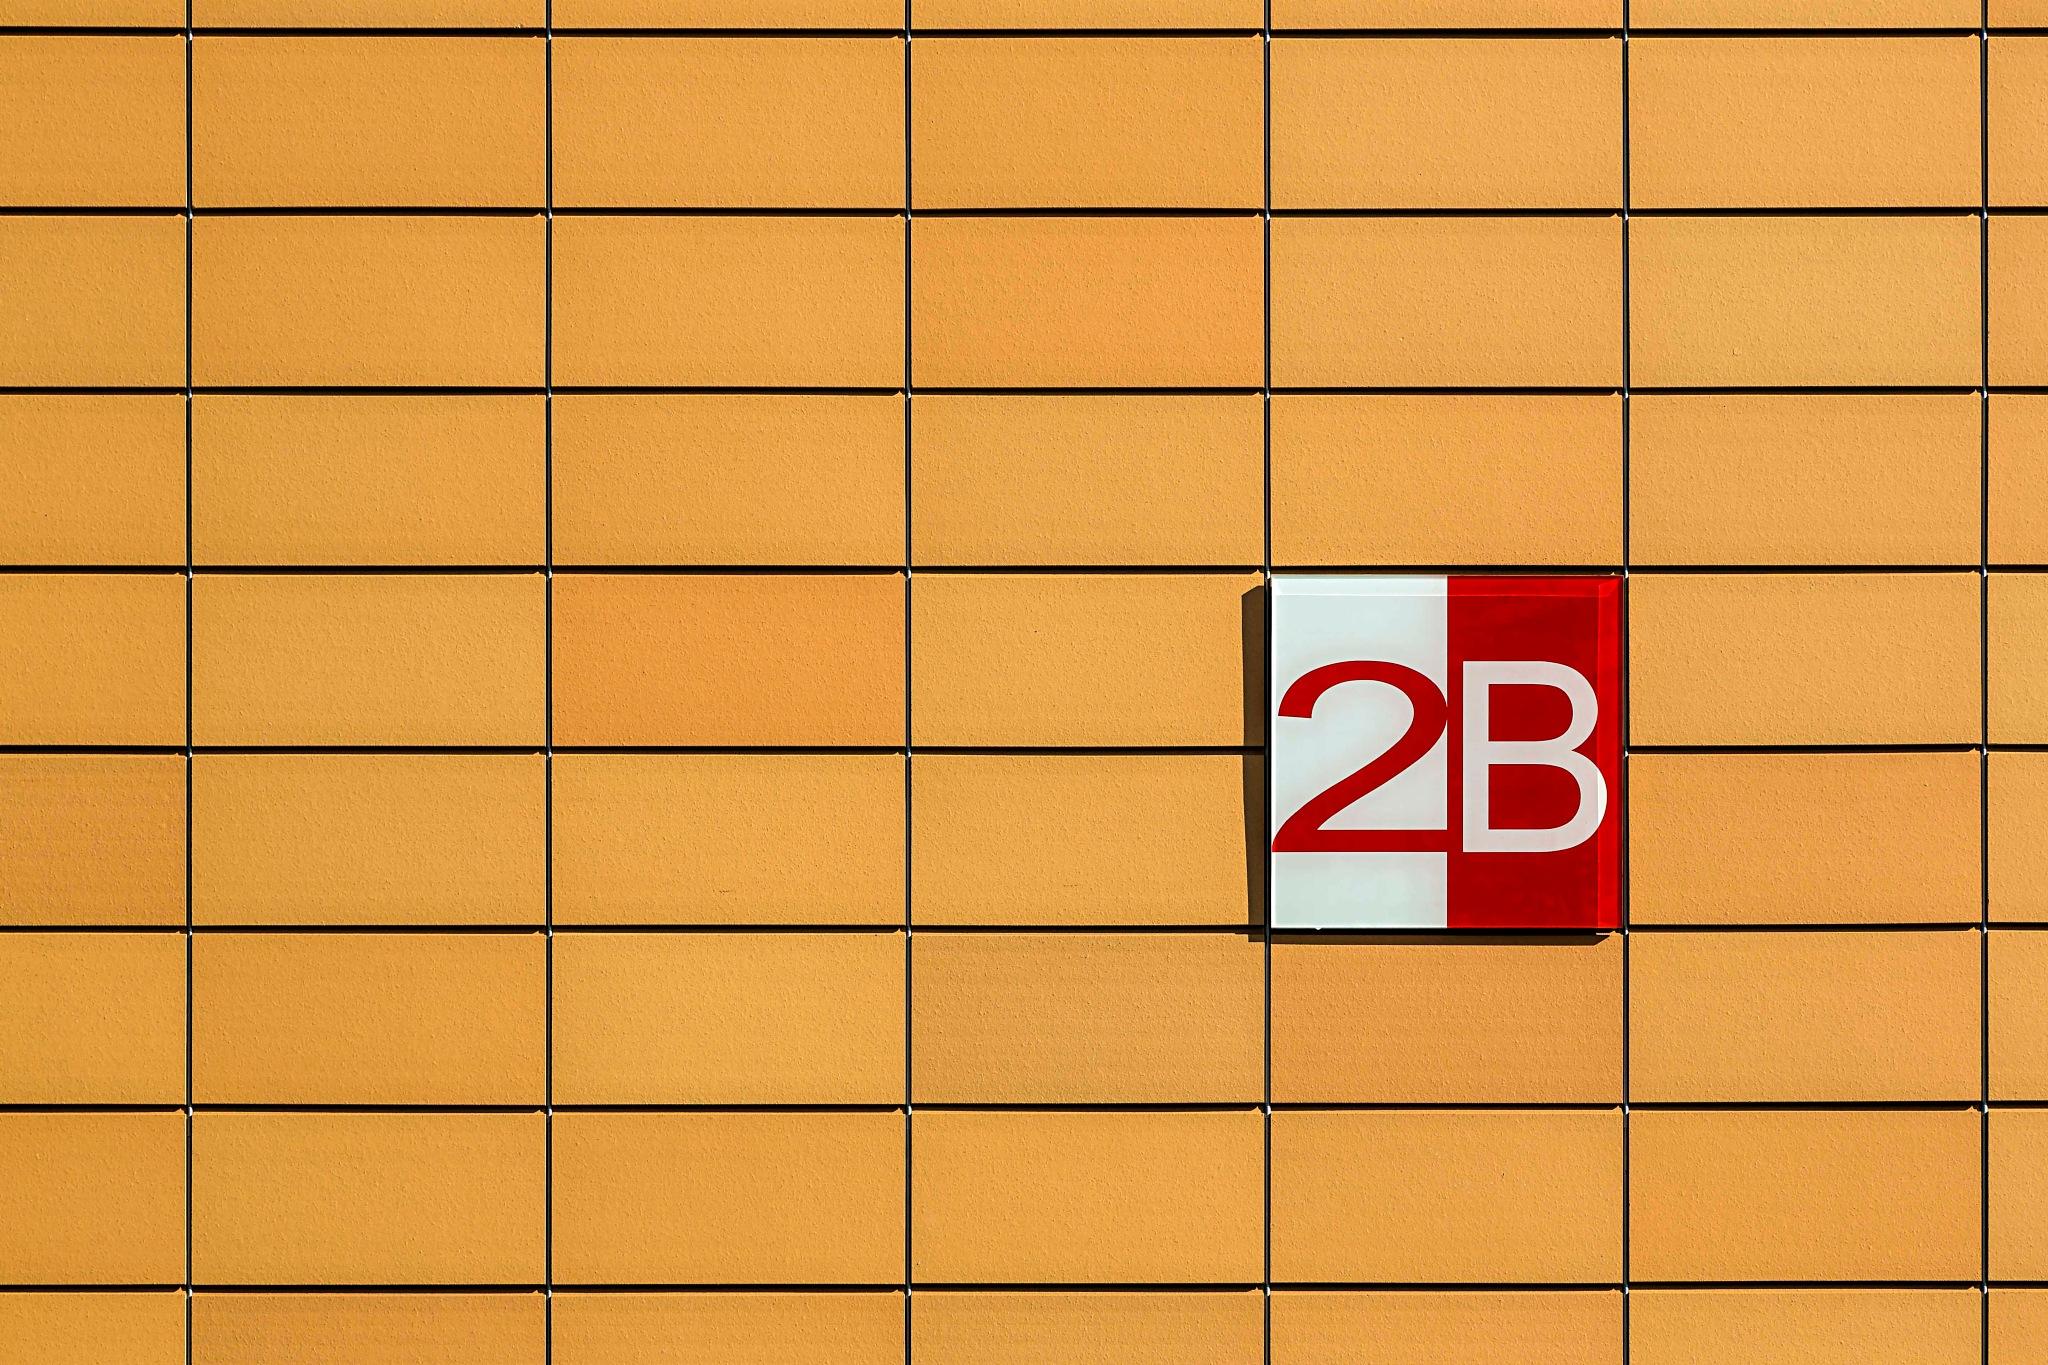 2B by AdolfBeck